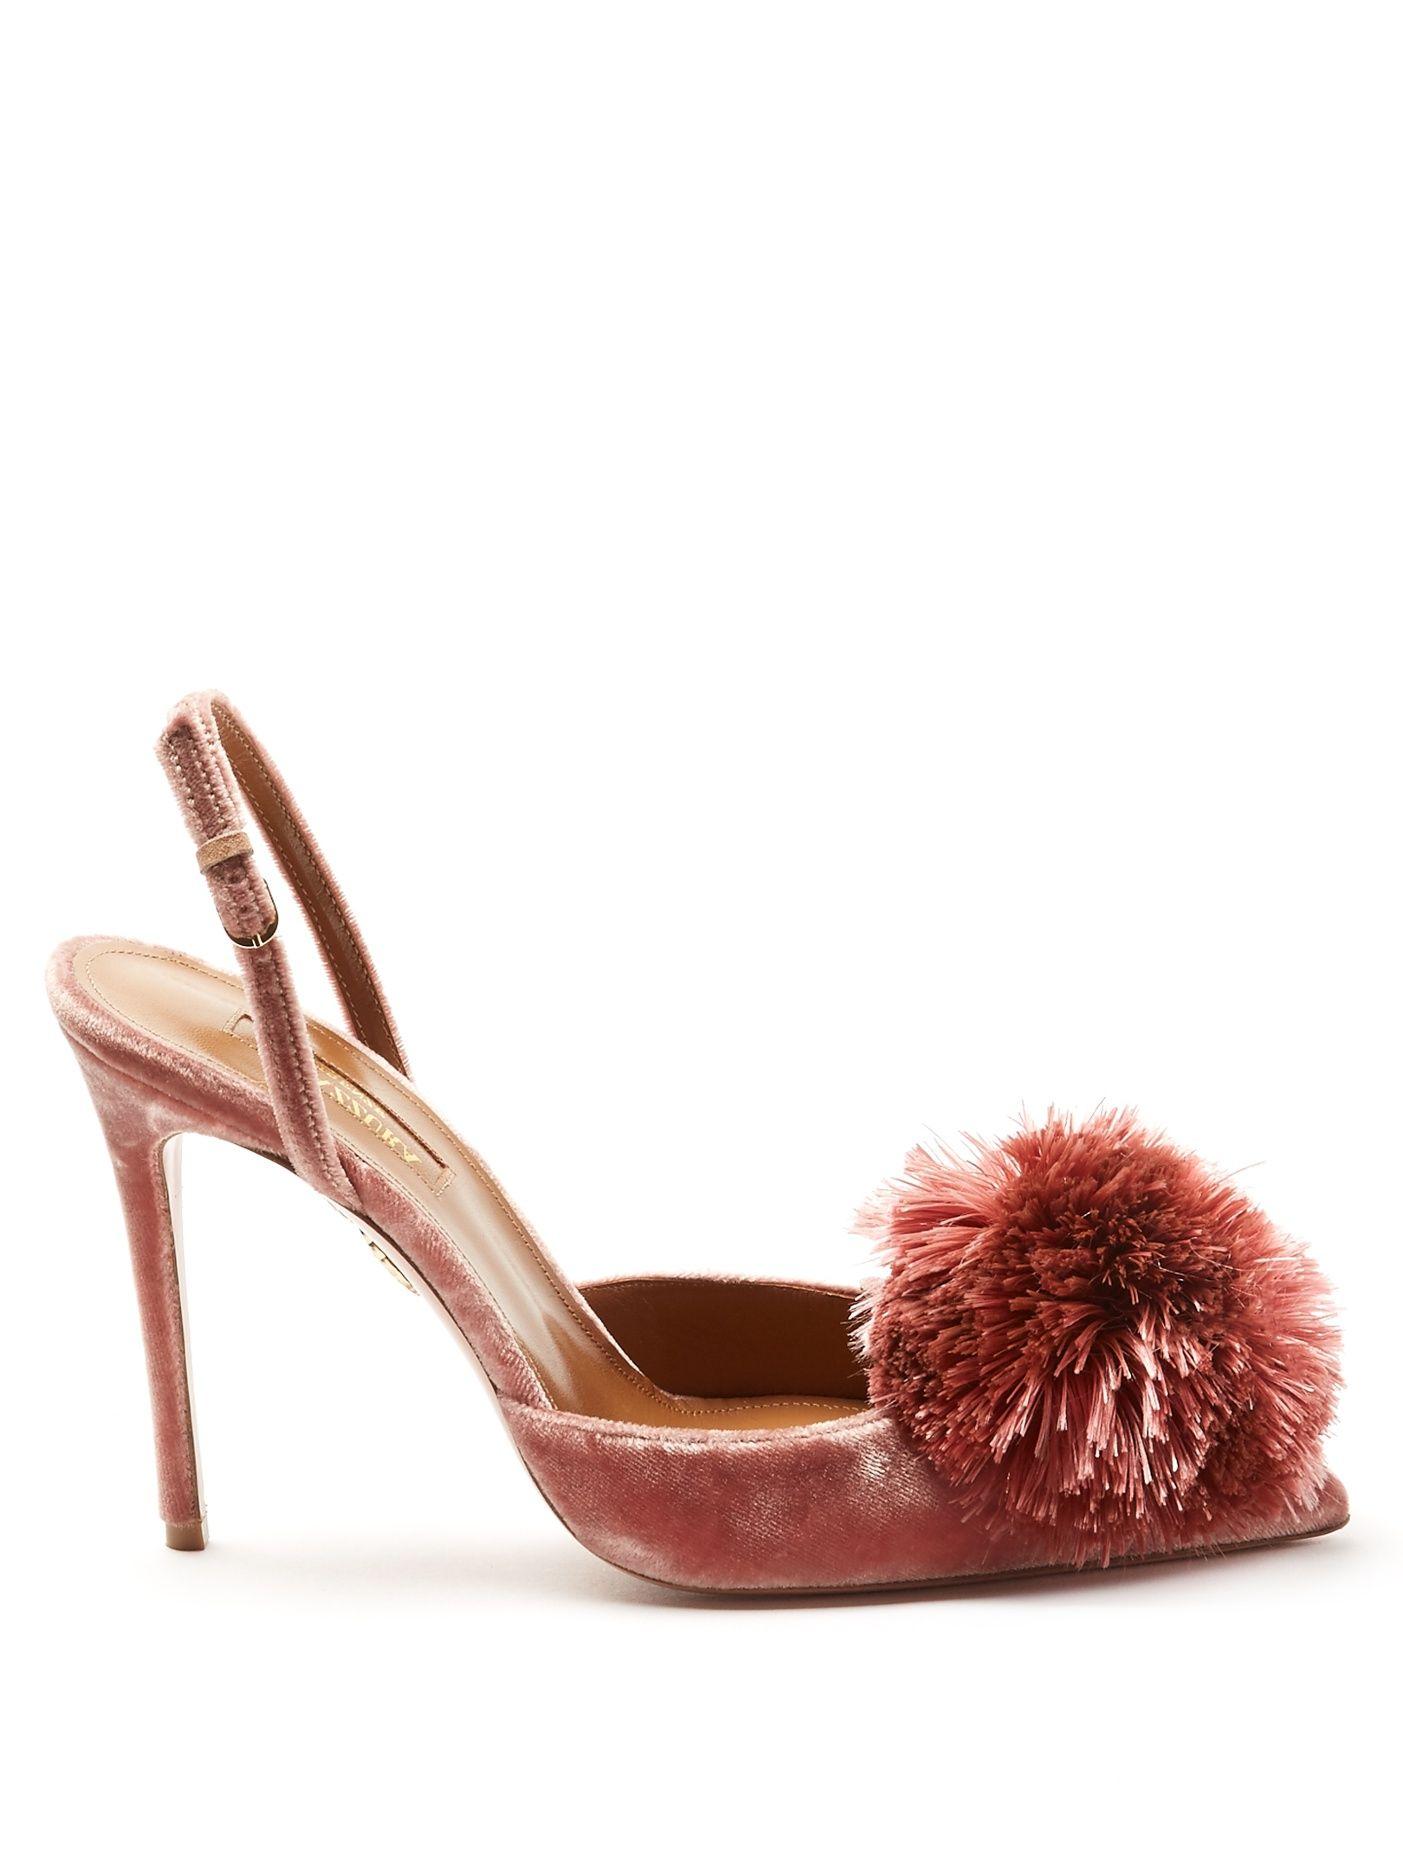 immagini ufficiali prima qualità scarpe originali Click here to buy Aquazzura Powder Puff velvet pumps at ...